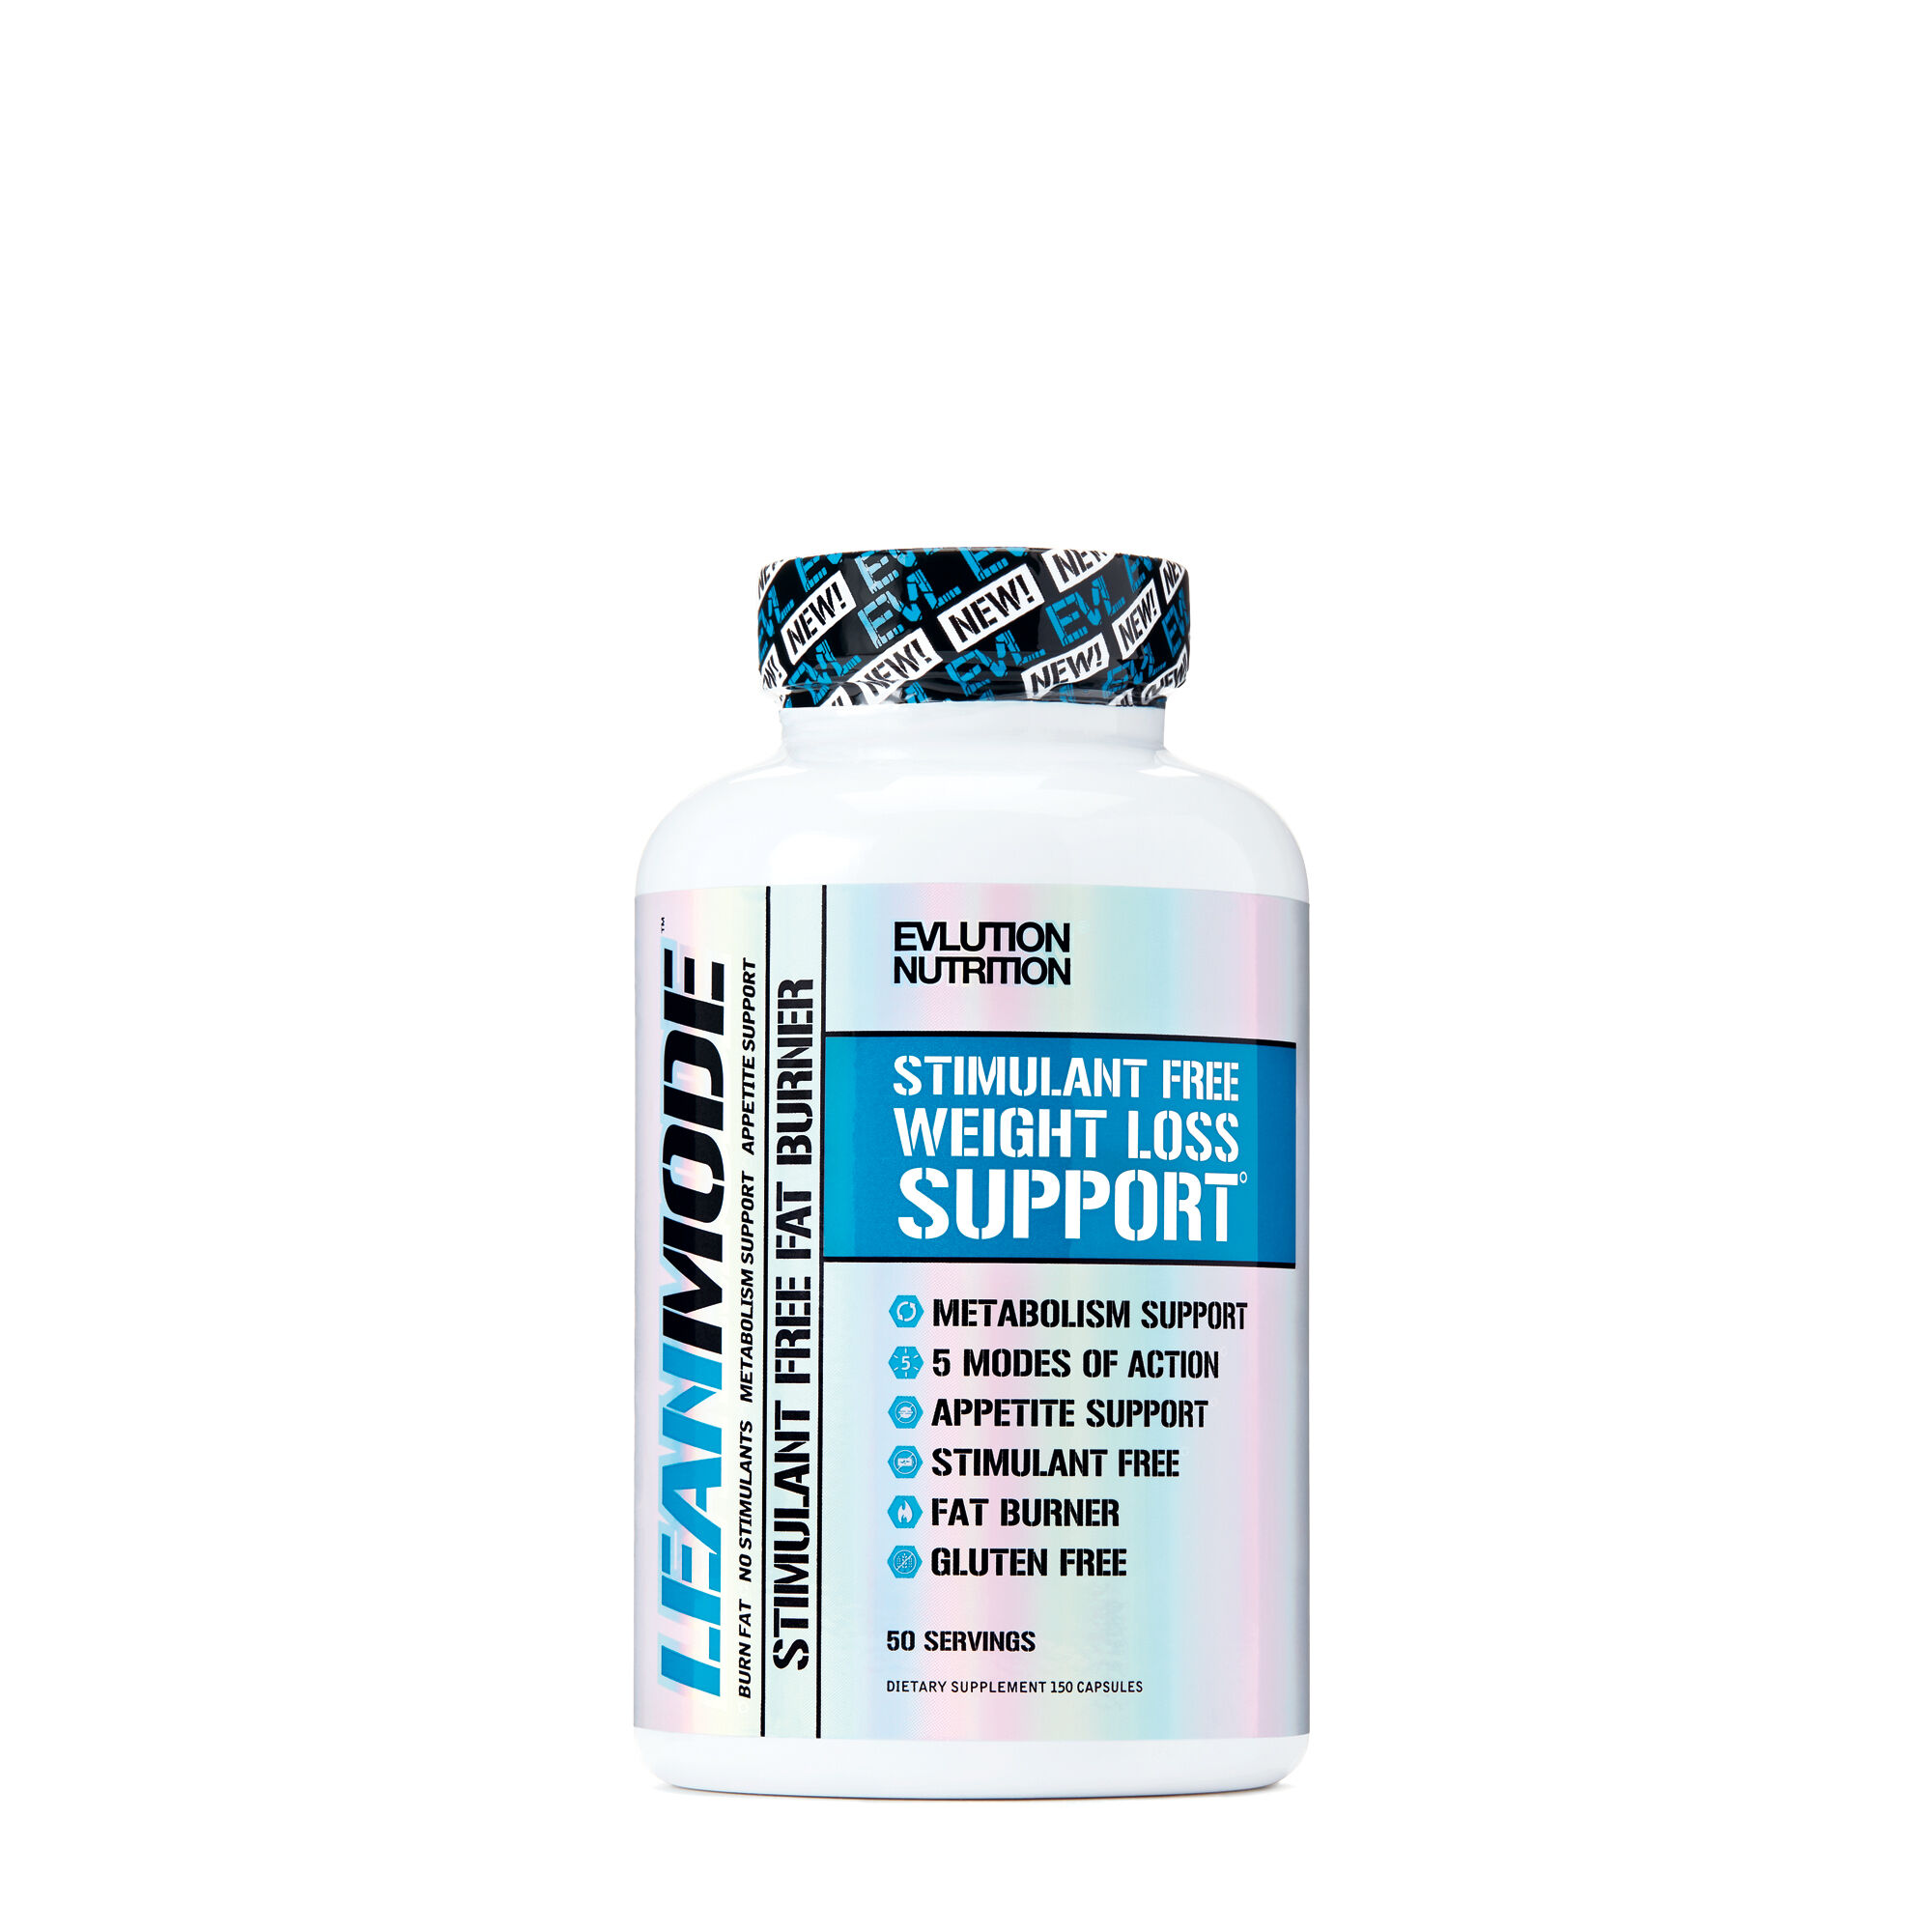 Fastin Gnc - Diet Support Formulas